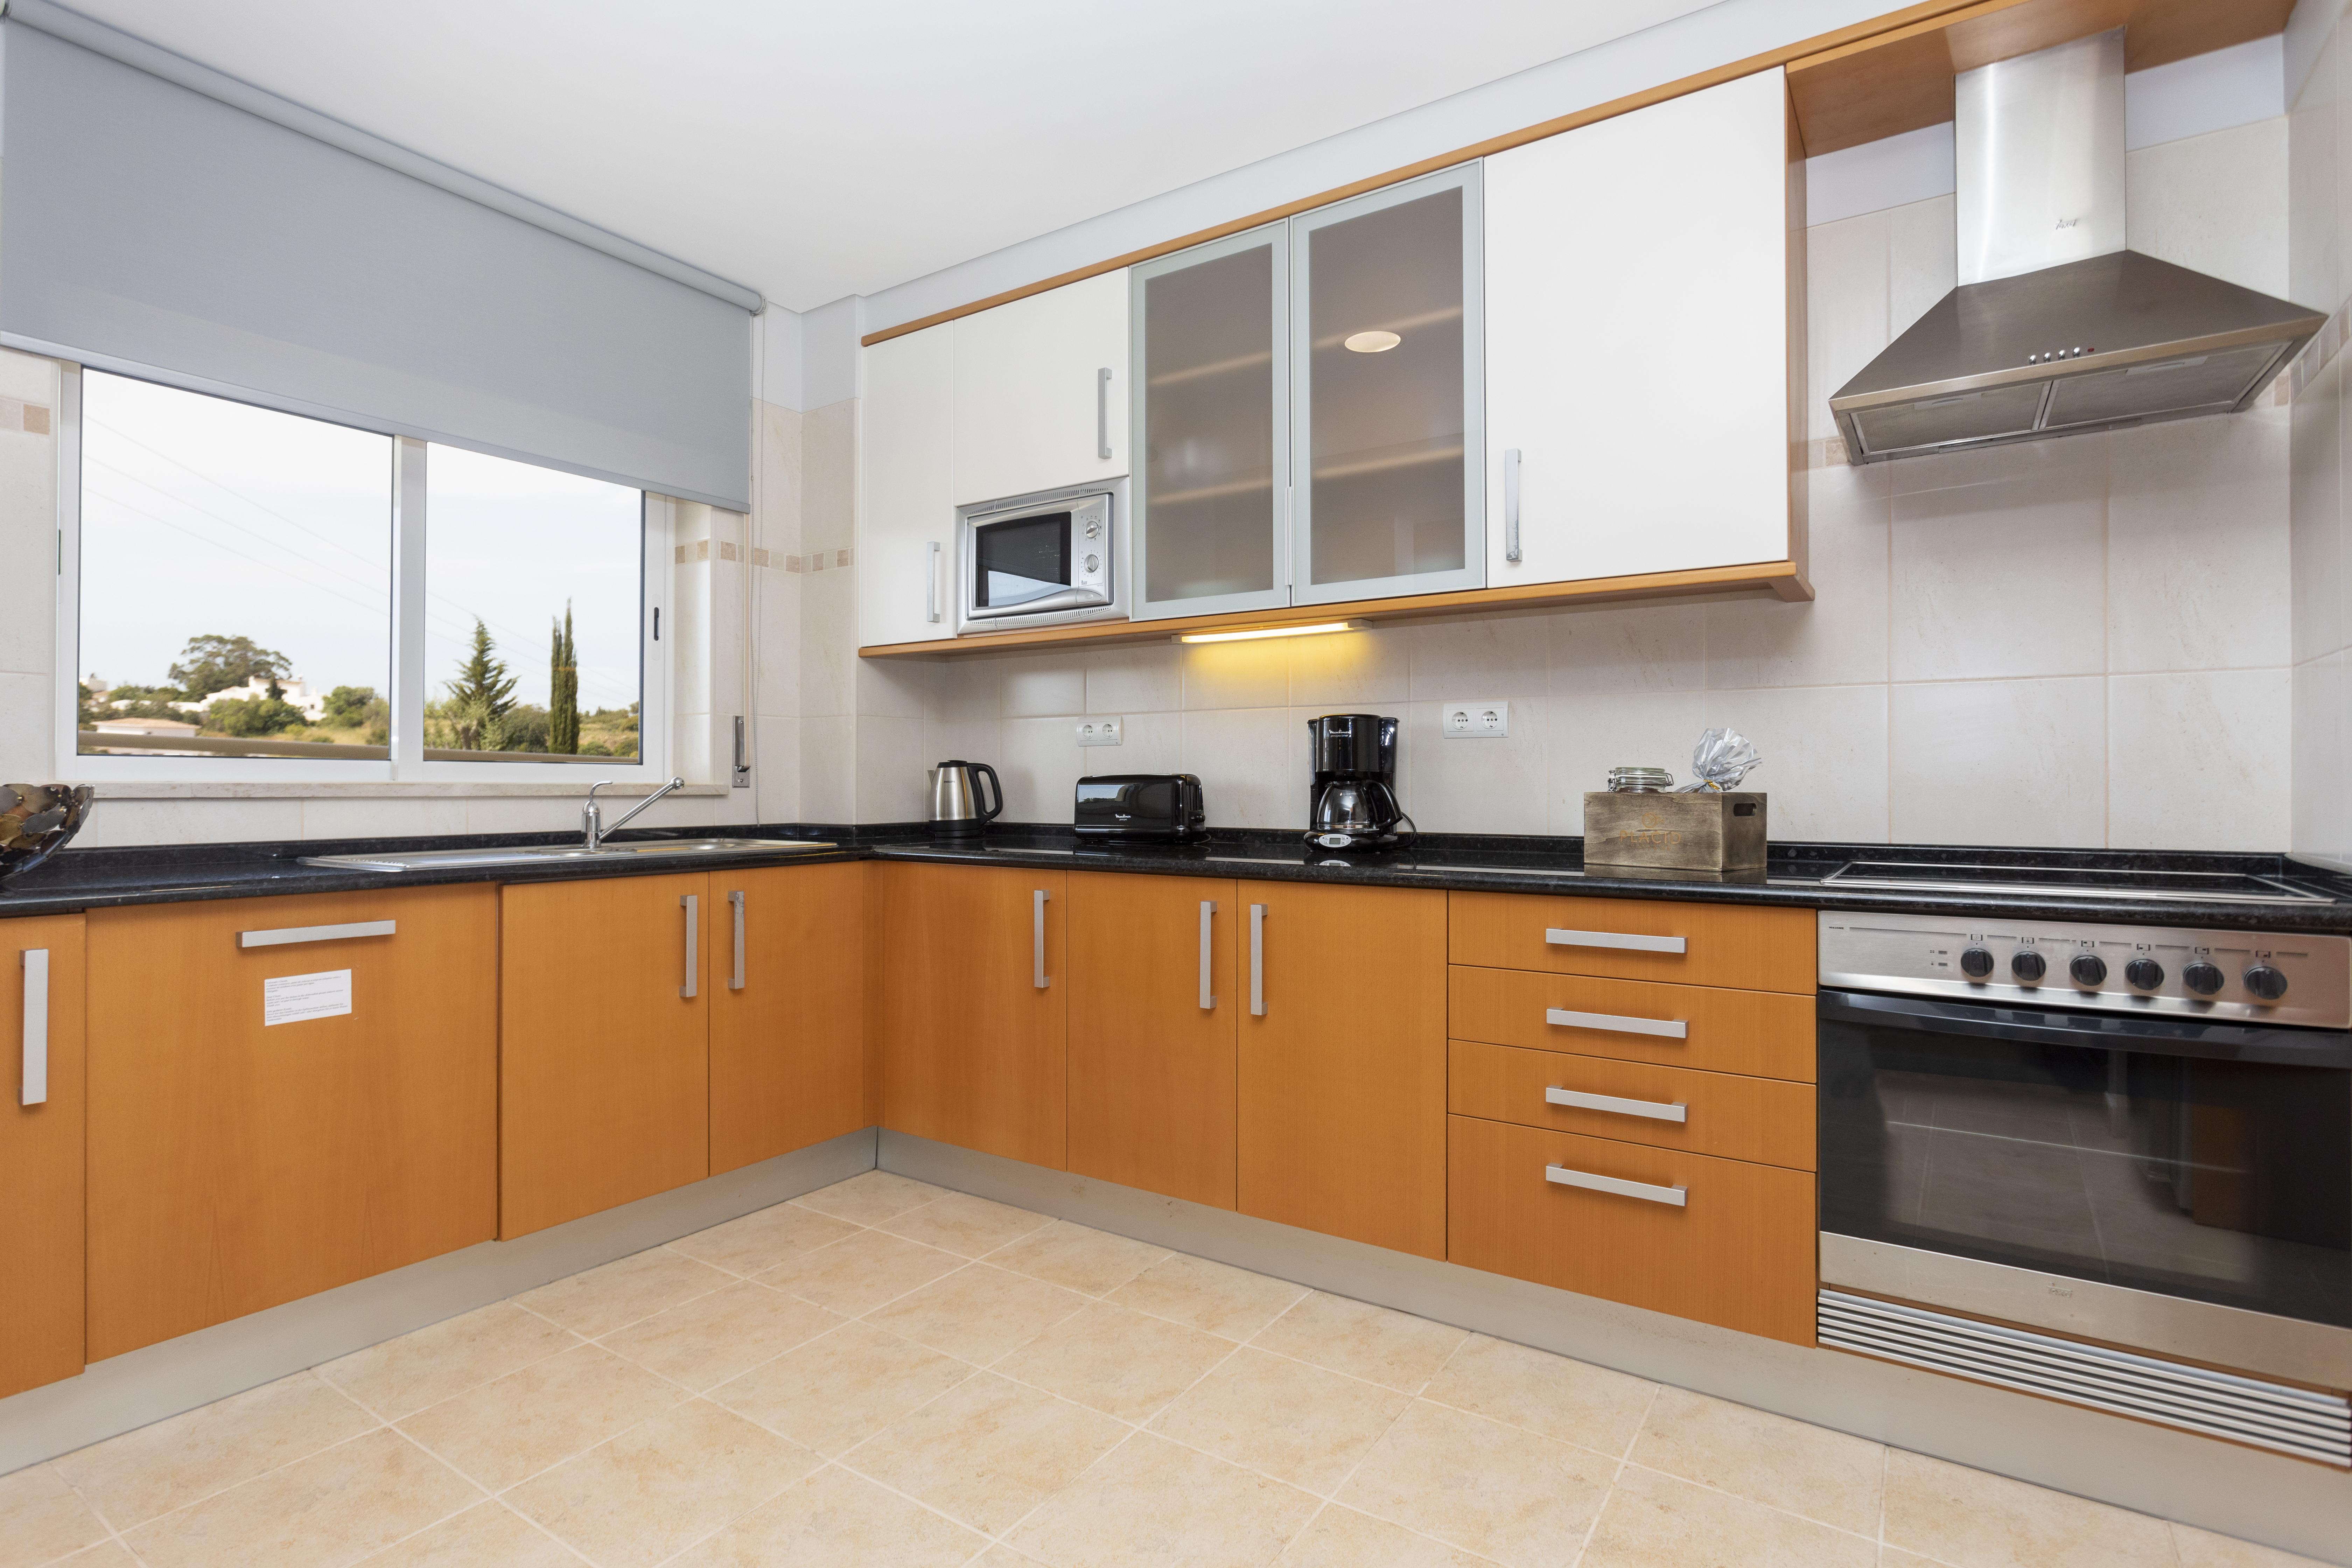 Placid-Village-Cozinha-Equipada